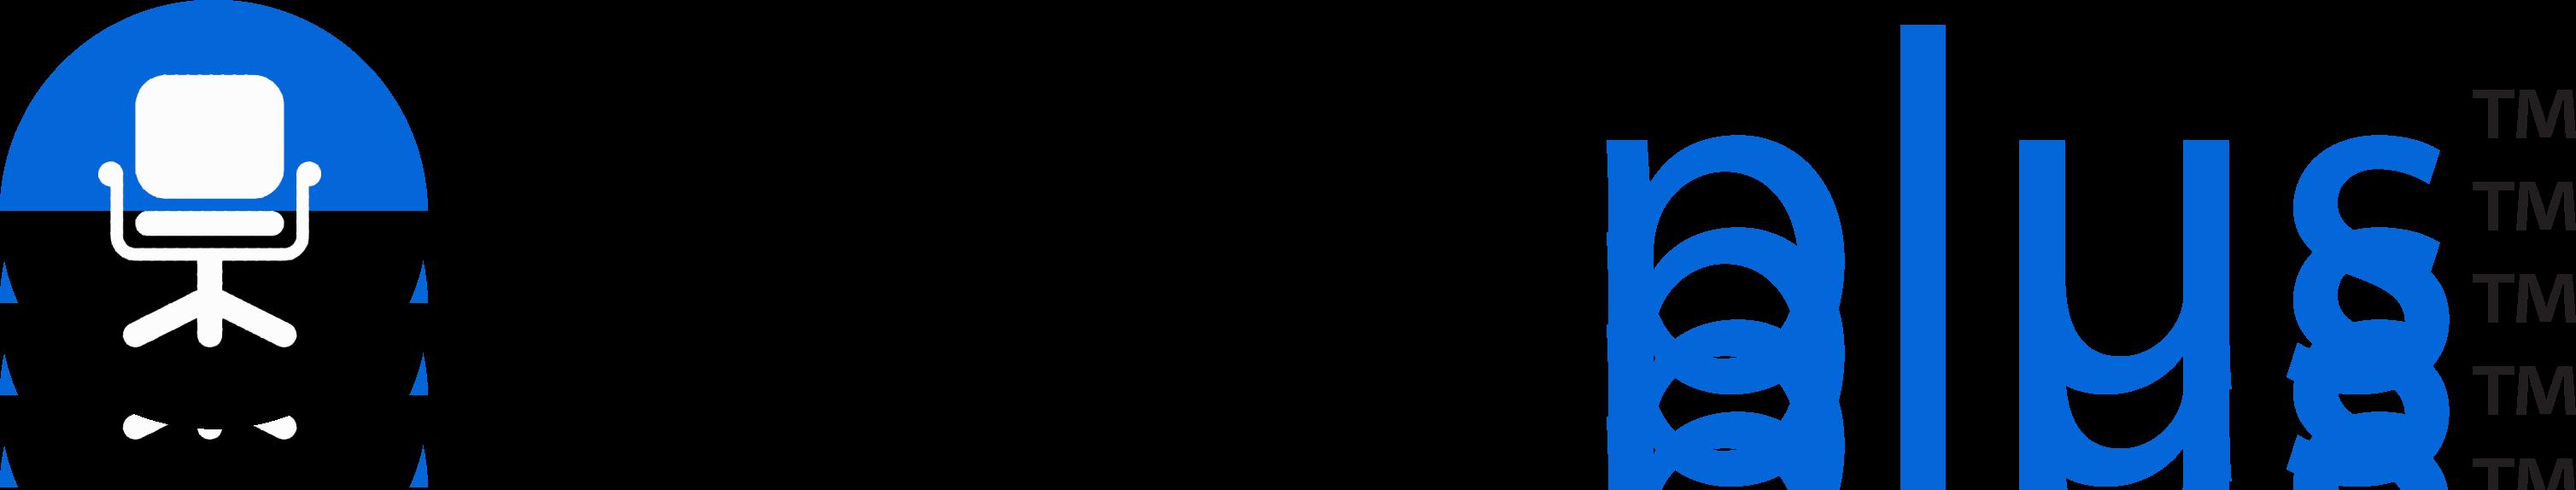 FF&Eplus logo